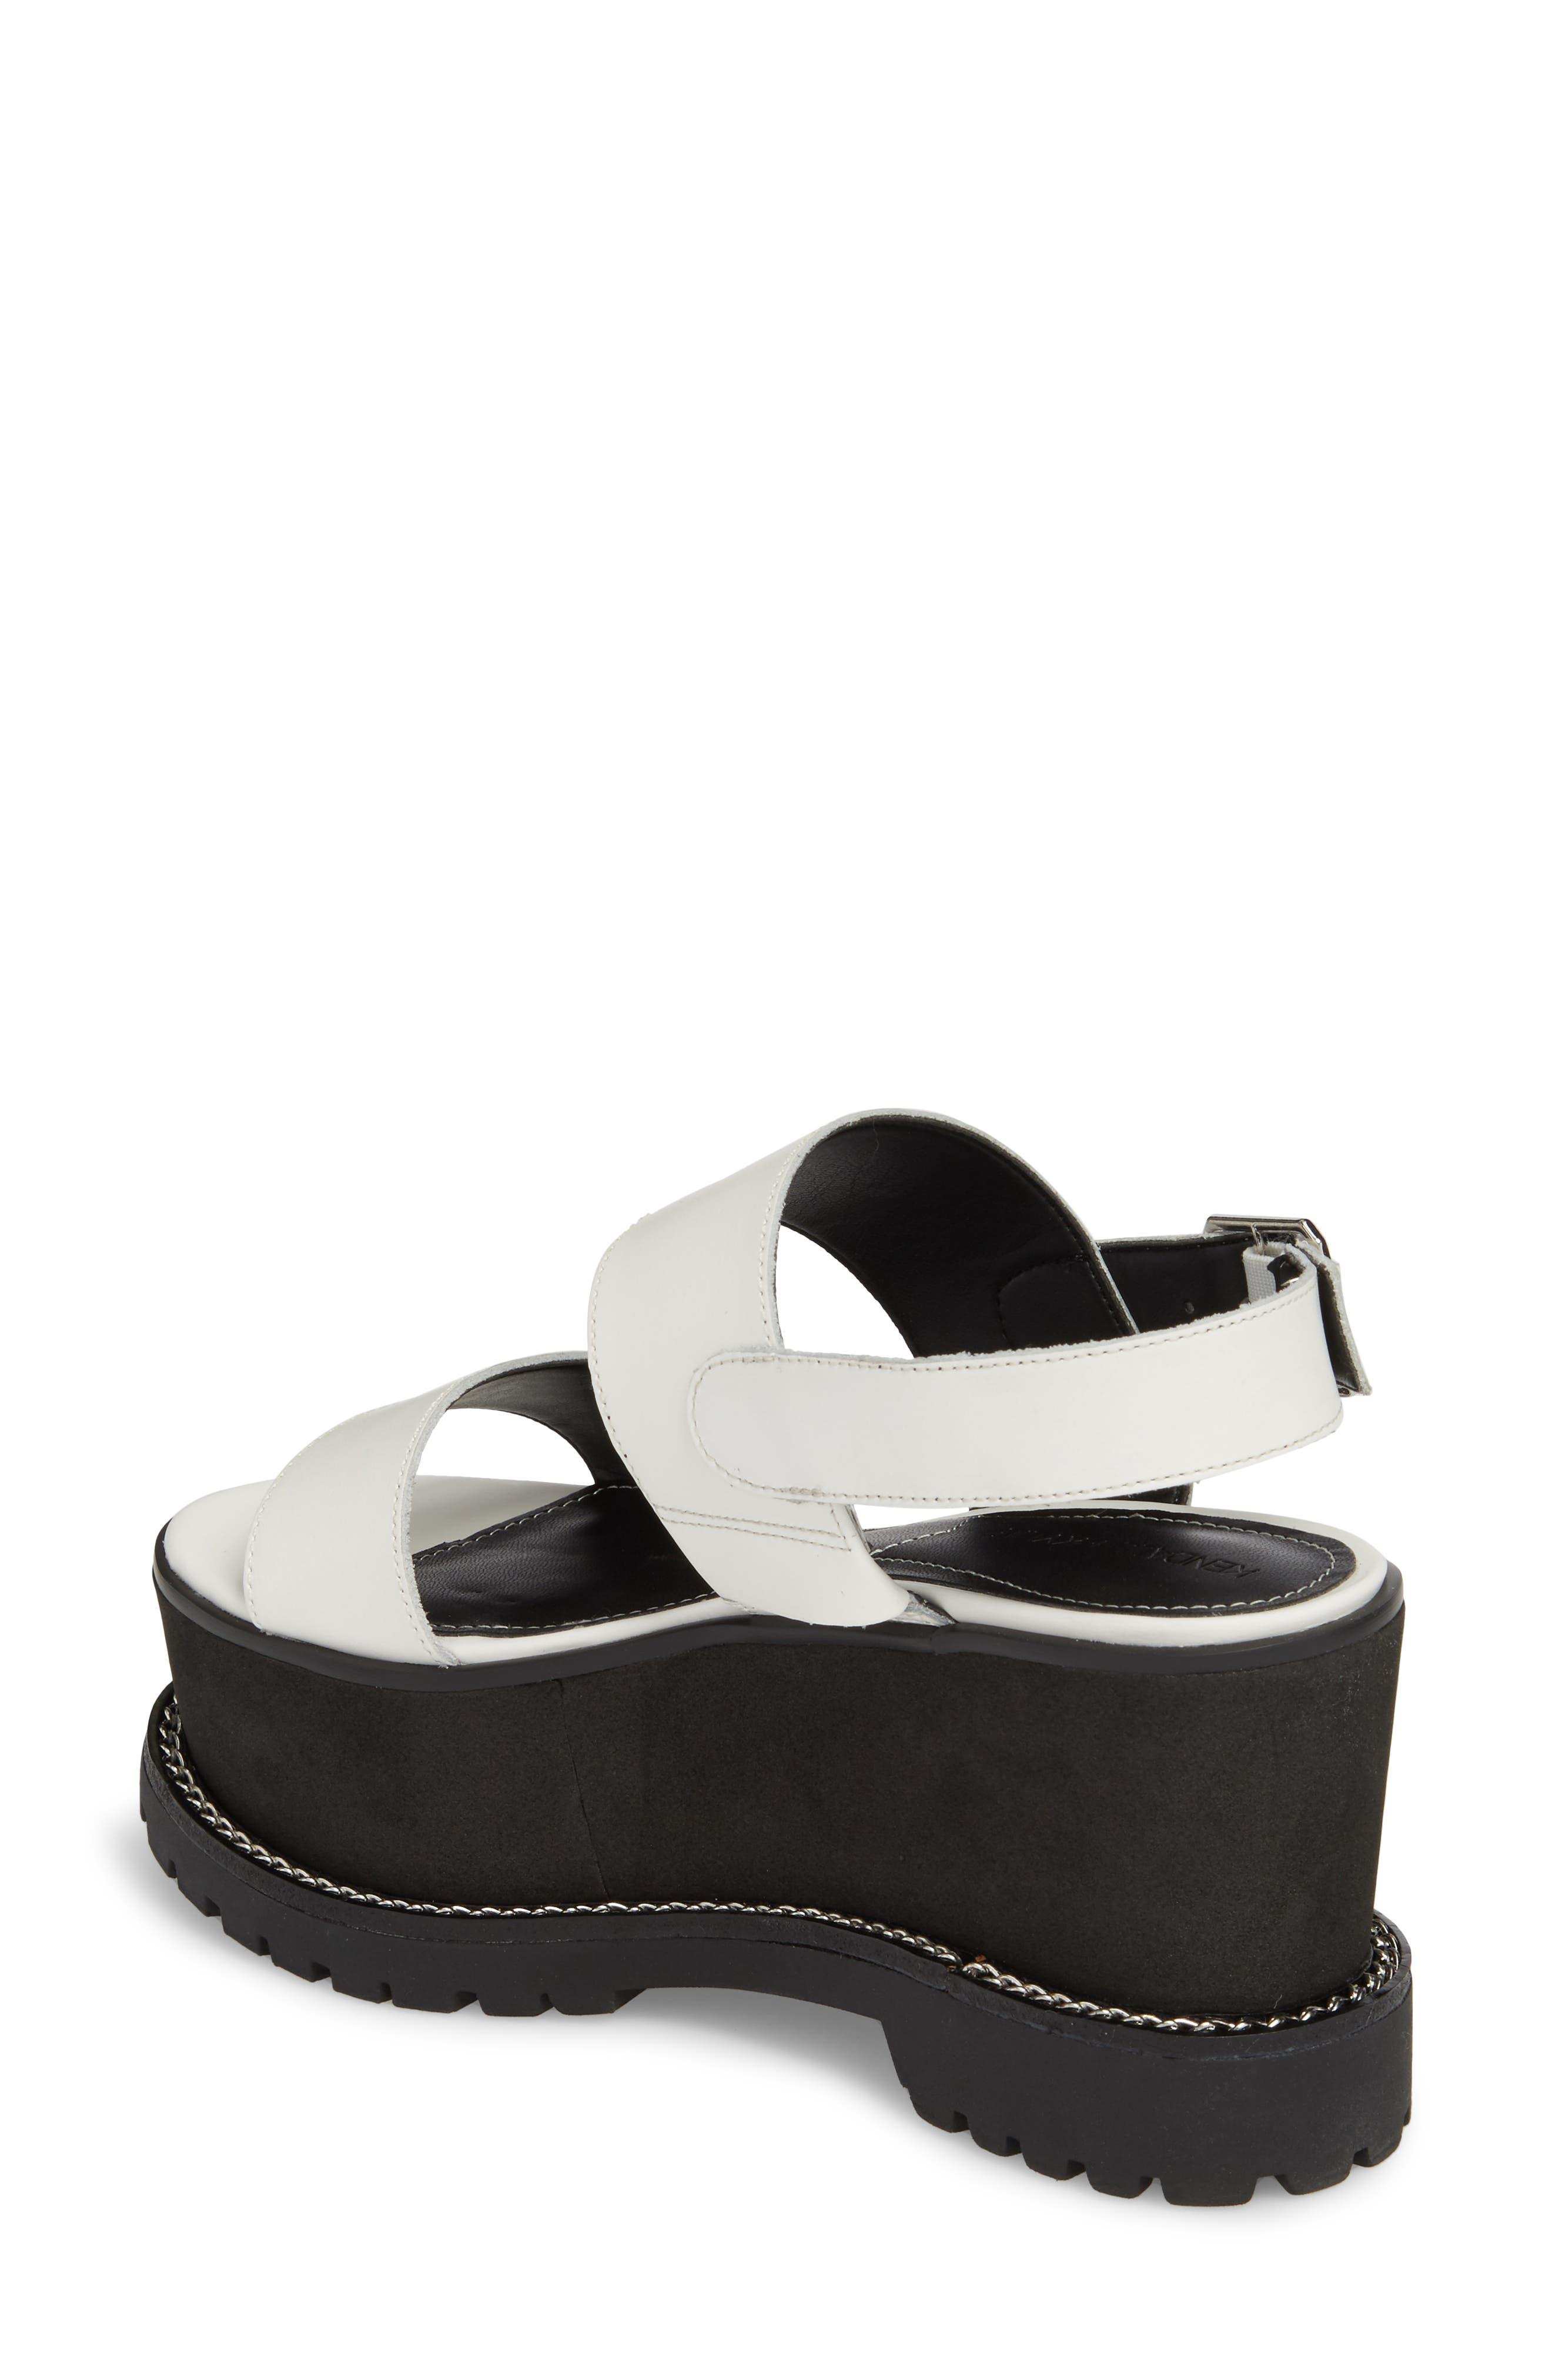 Cady Platform Sandal,                             Alternate thumbnail 4, color,